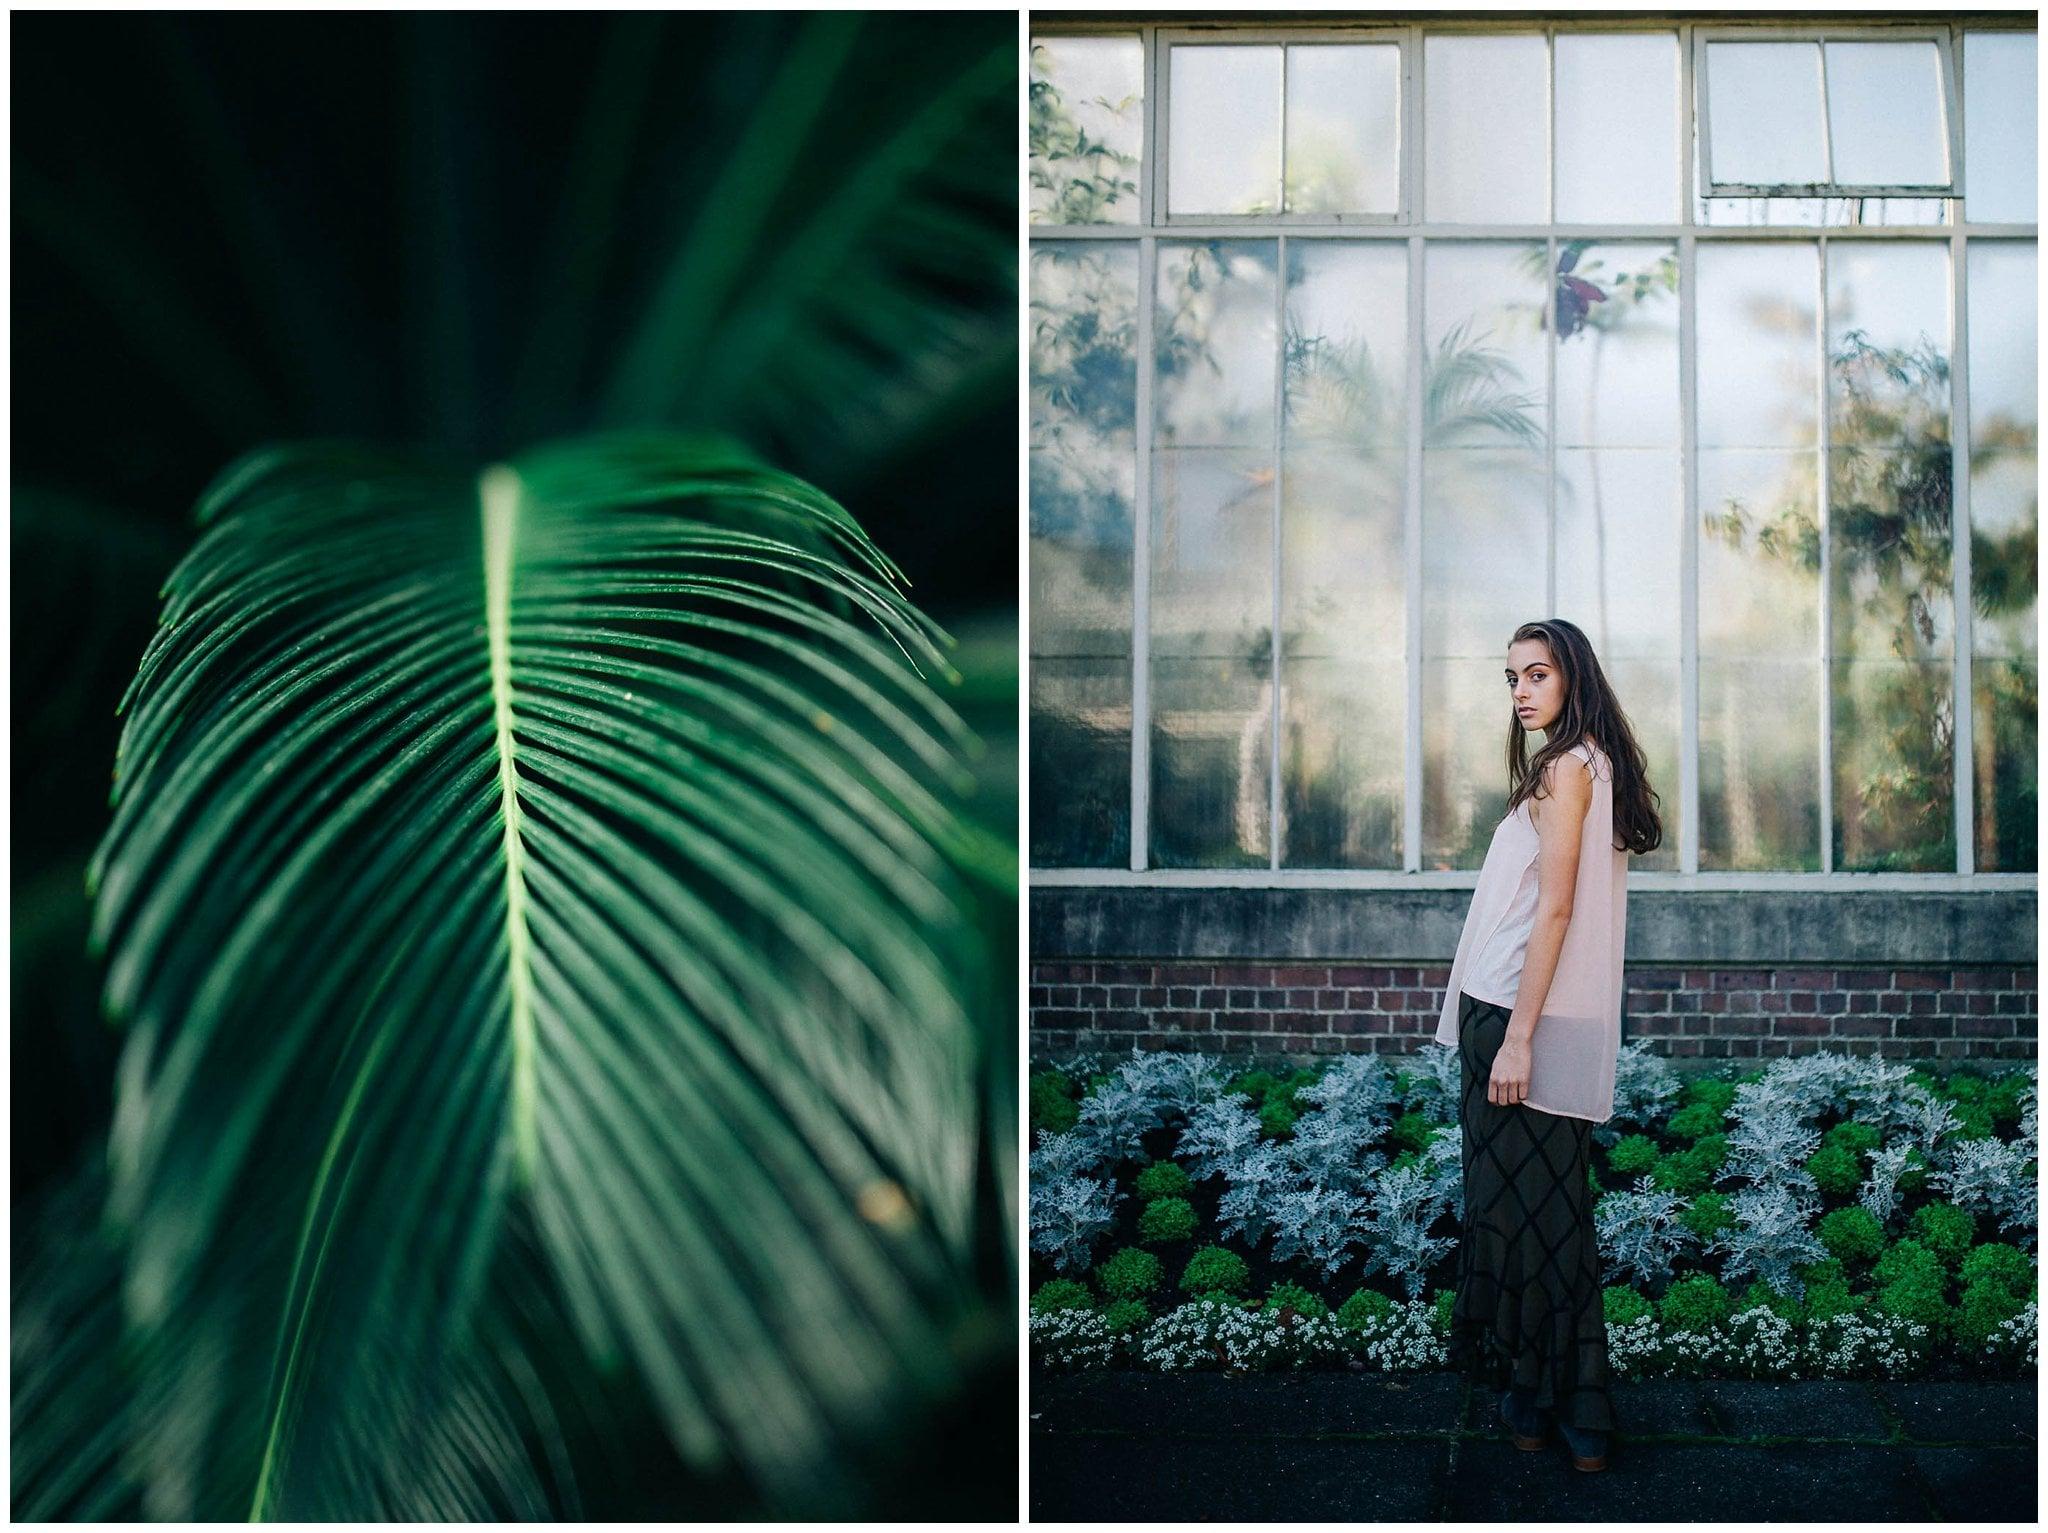 Ellen Richardson - Fashion - Primavera_0007.jpg